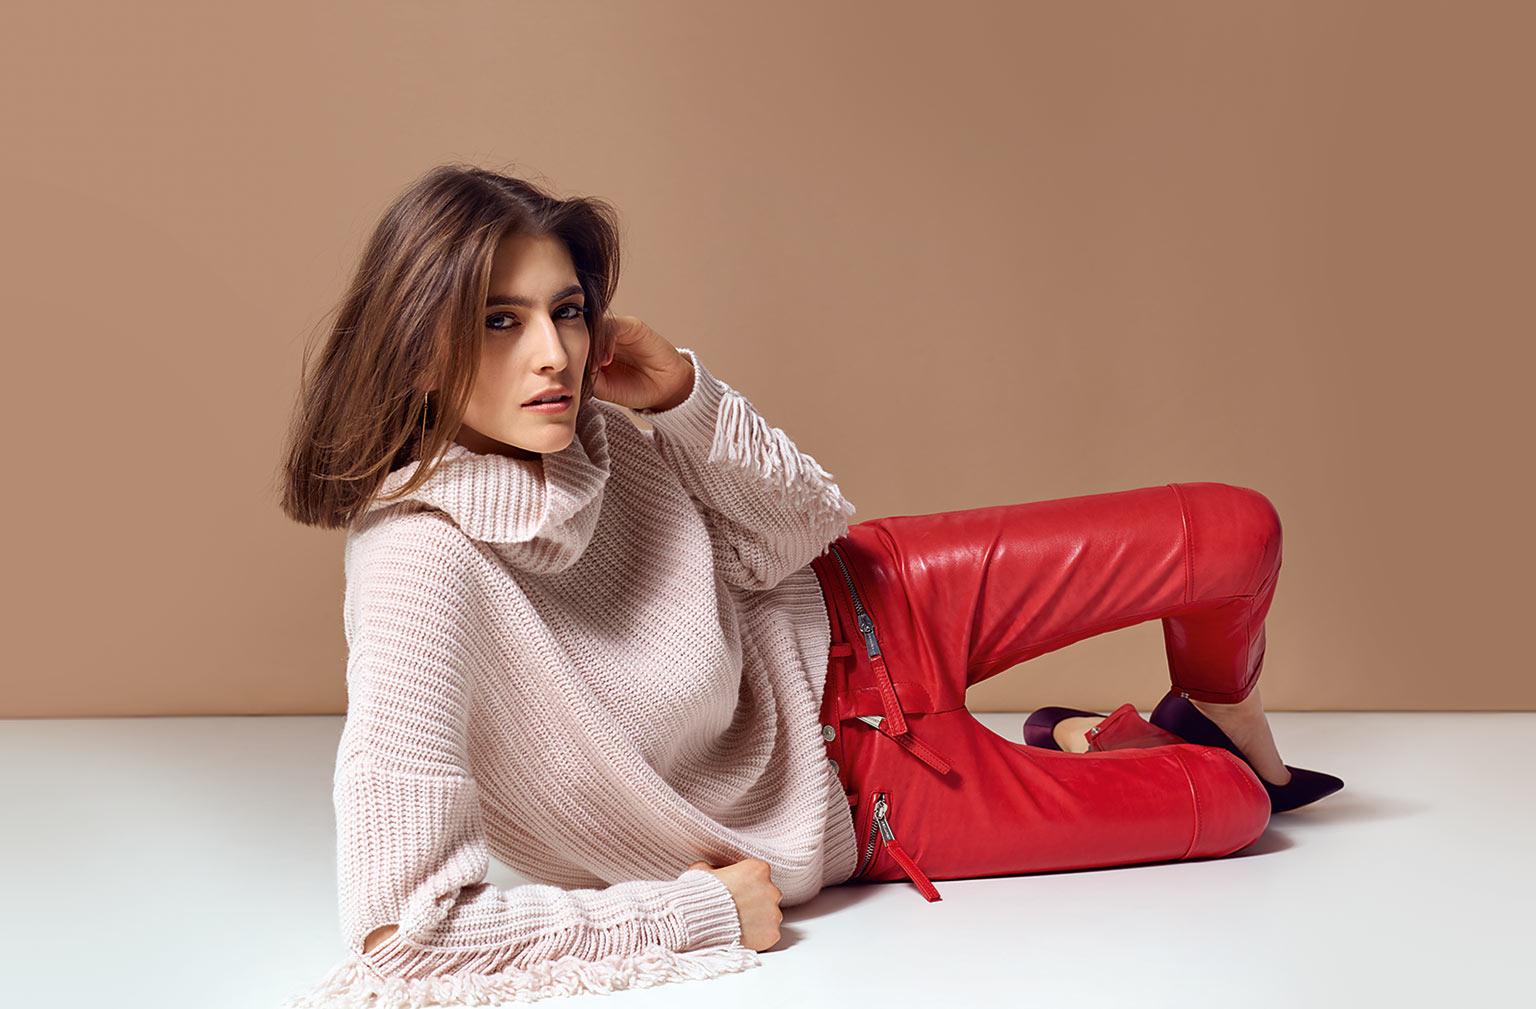 Esisto Herbst Winter 2018 Cashmere Mode - Pullover rosa